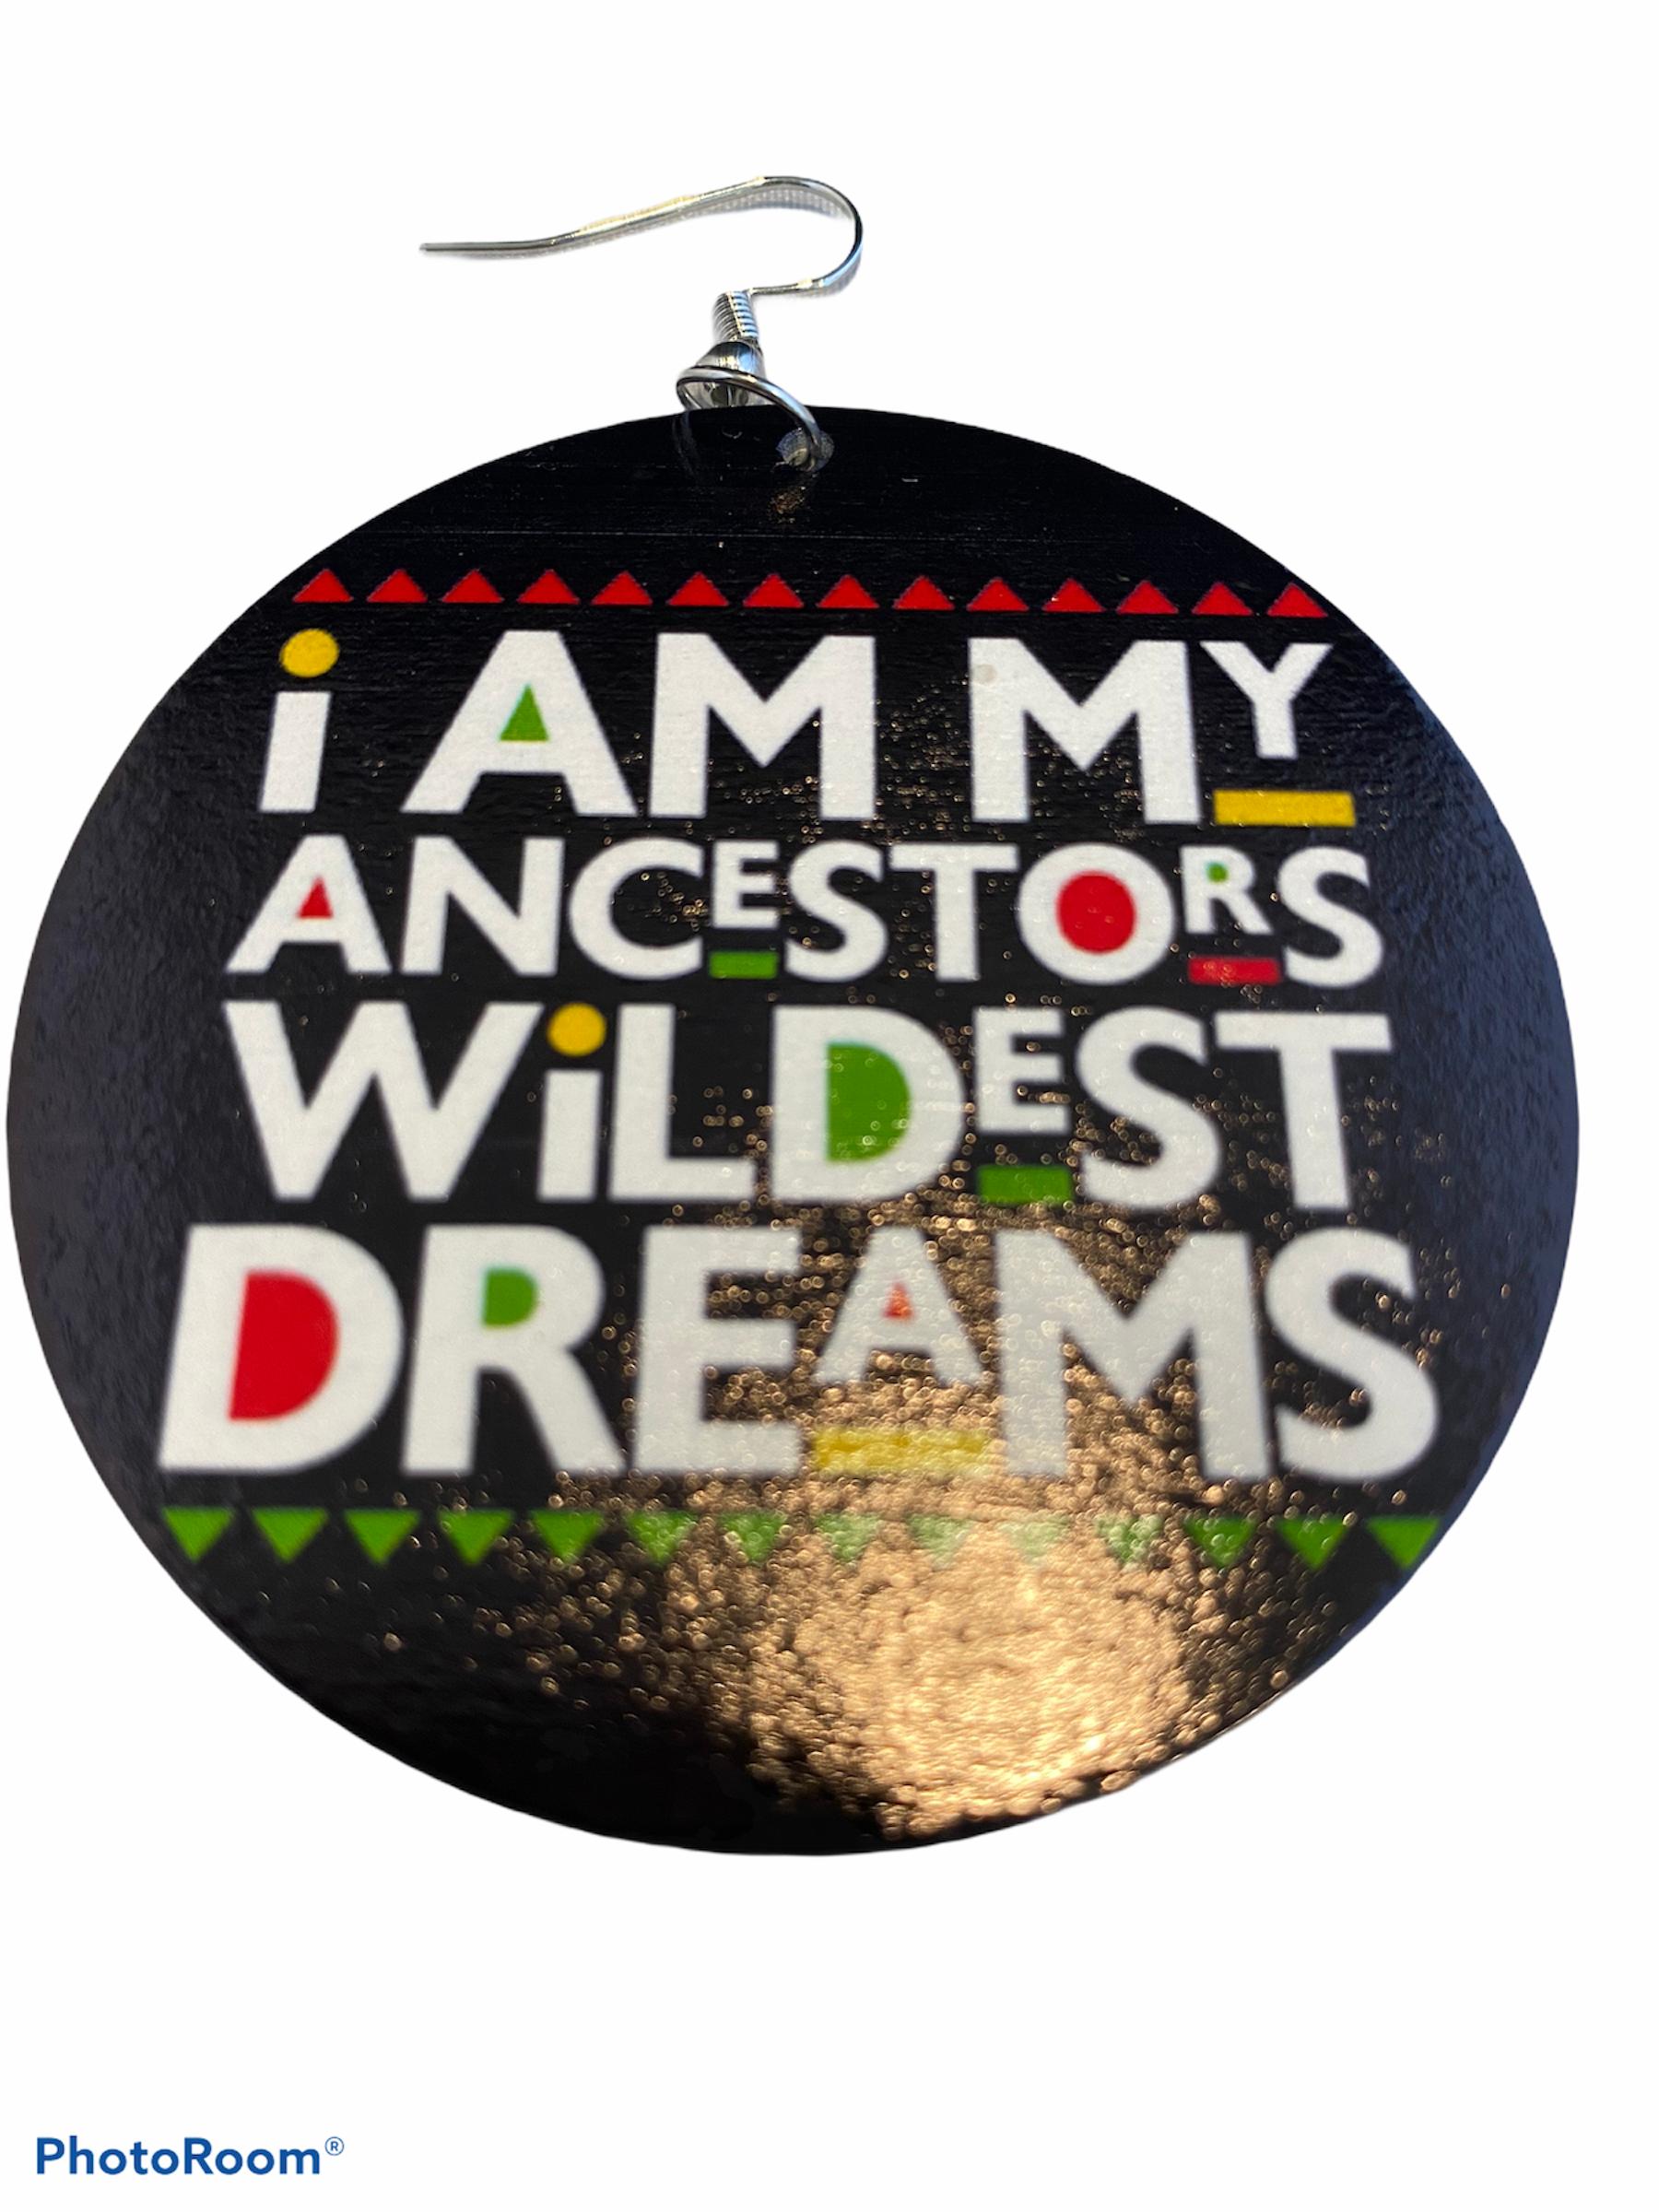 My Ancestors Wildest Dreams Melanin Black Custom Wooden Earrings Lightweight Education Sorority Girls Historically Black College University